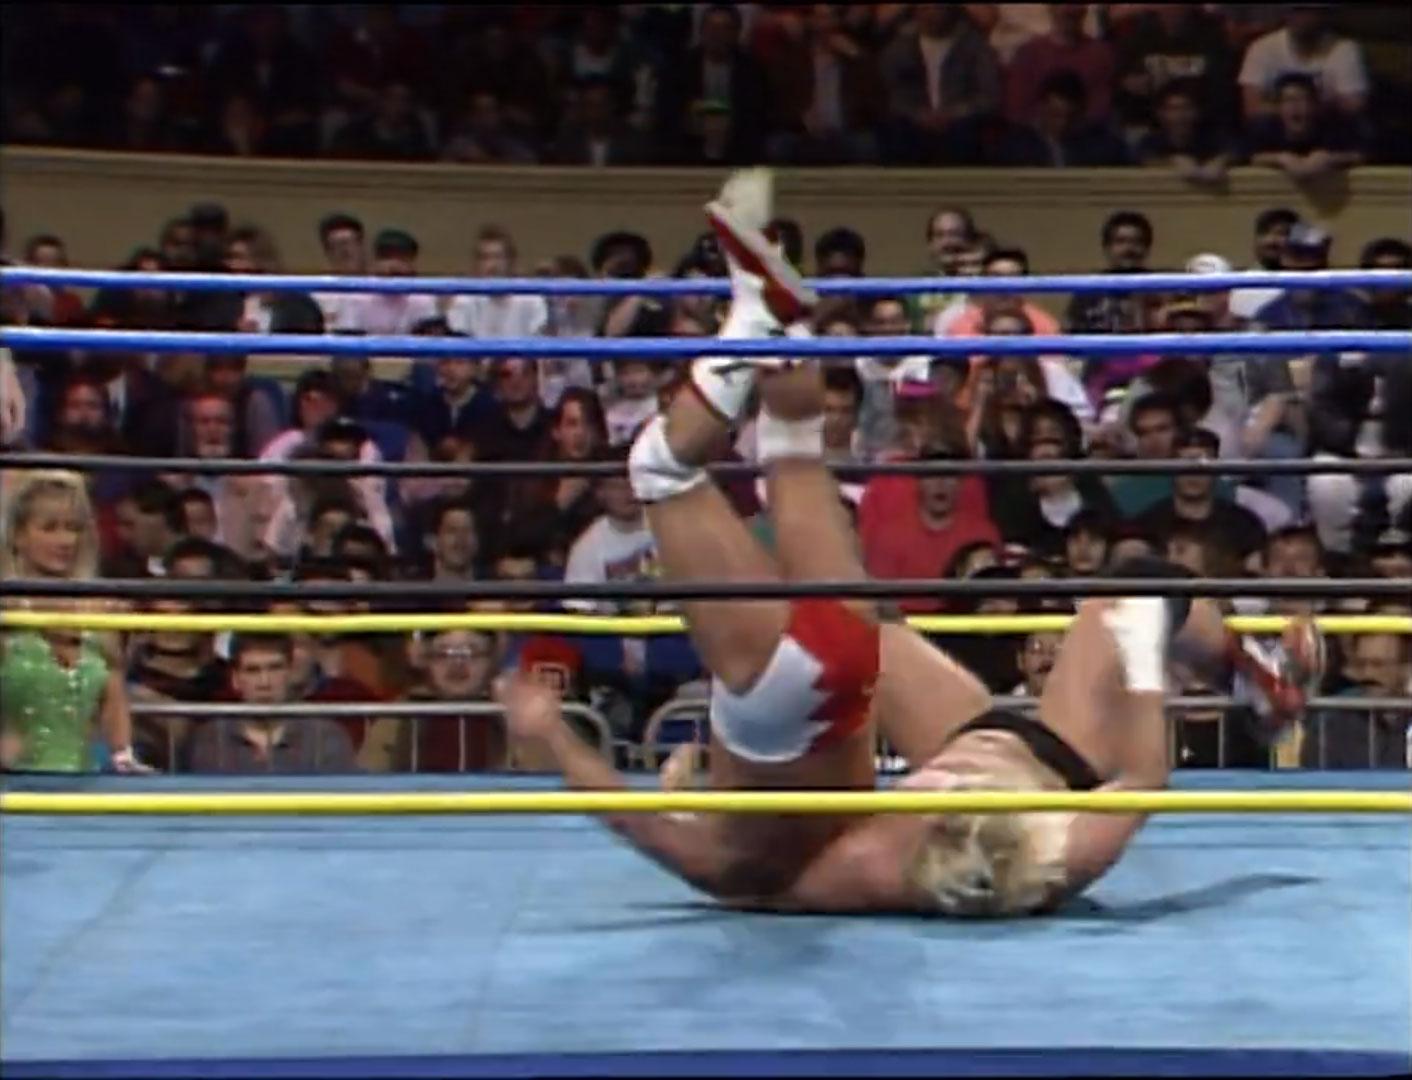 Barry Windham, Dustin Rhodes vs. Larry Zbyszko, Steve Austin WCW SuperBrawl II Feb 29th 1992